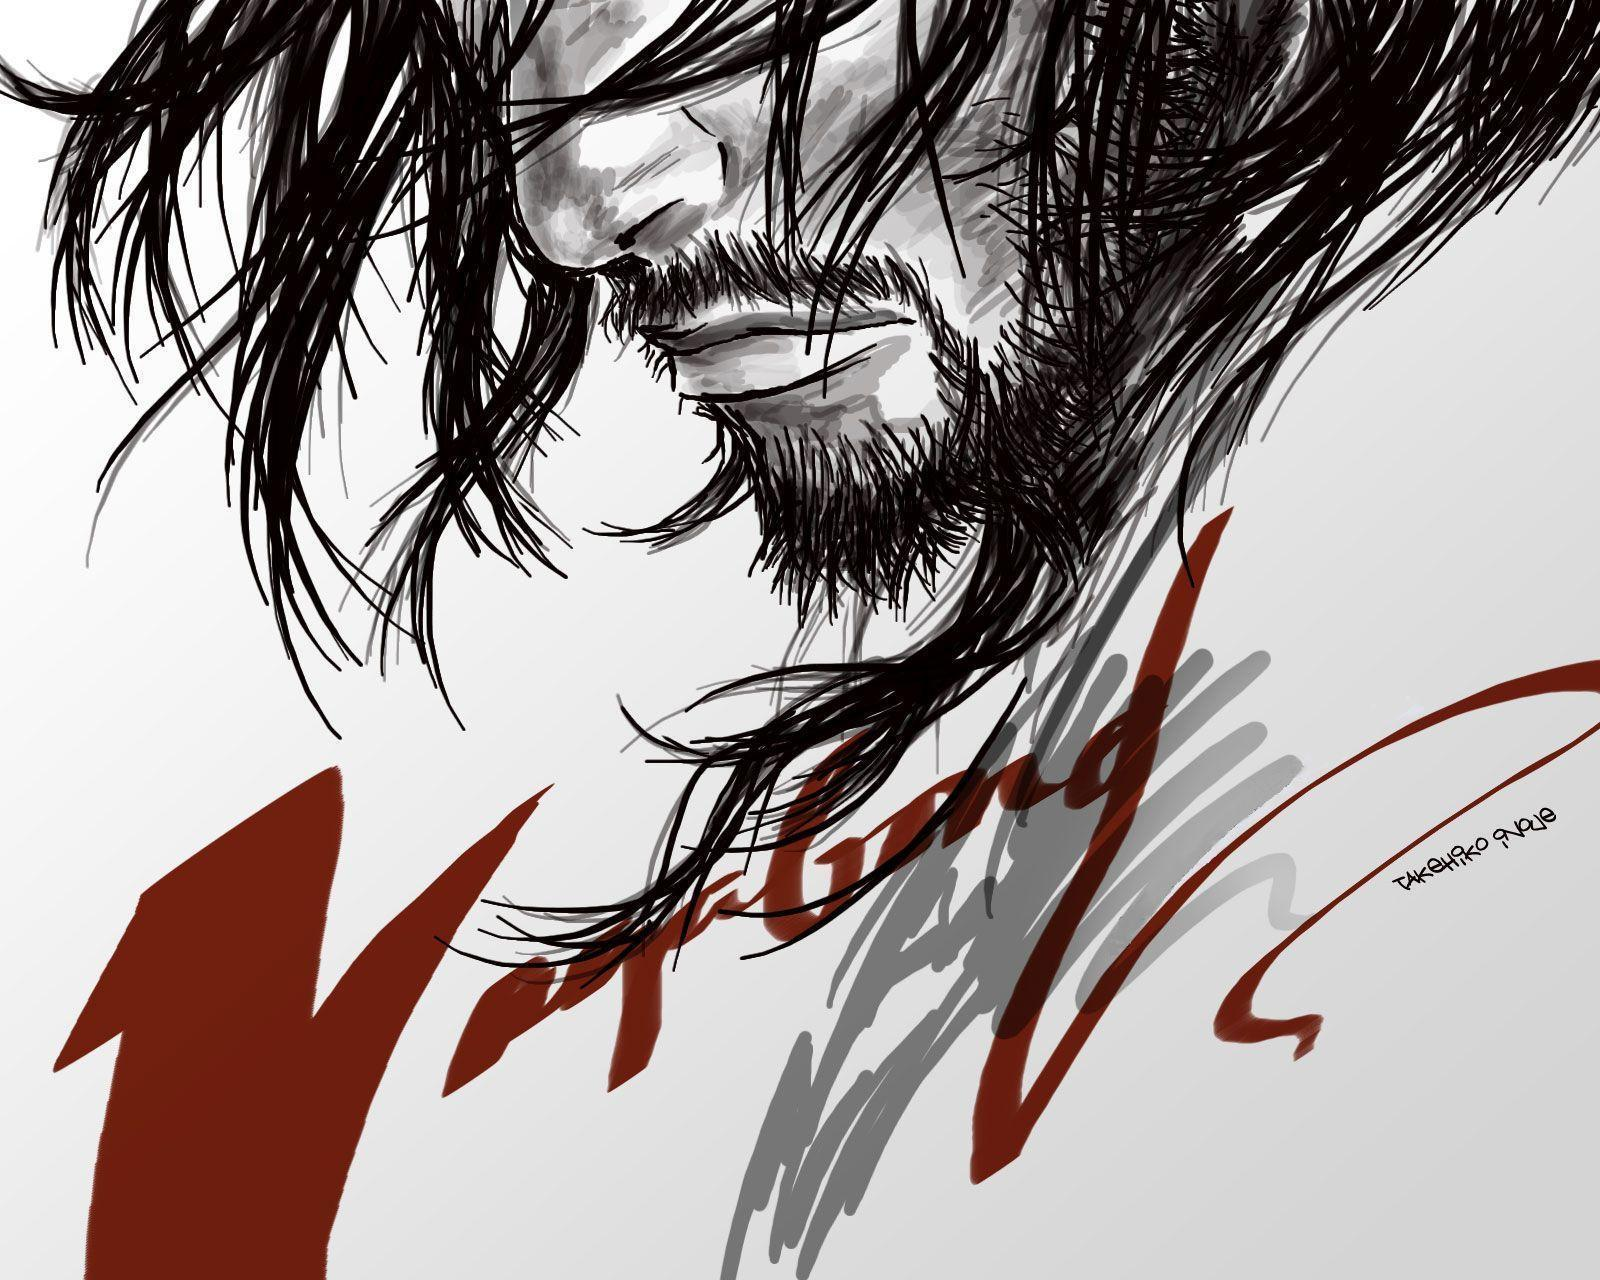 Images For Vagabond Manga Wallpaper